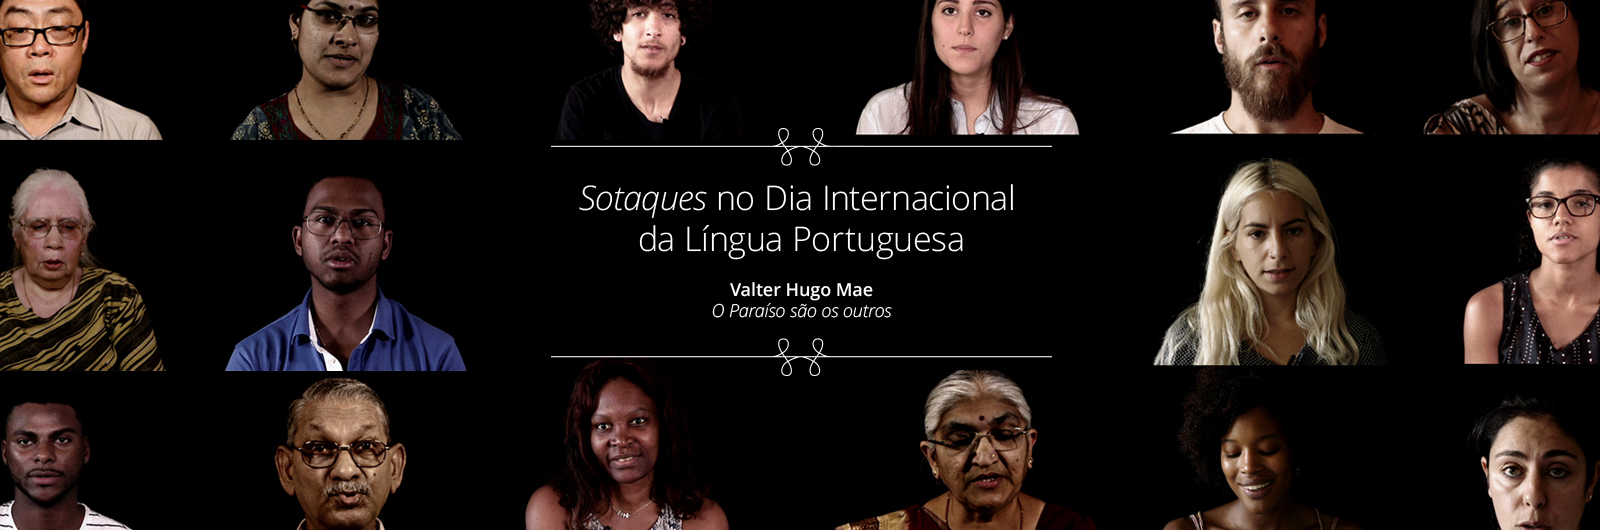 Porto Editora elogia a diversidade dos sotaques no Dia da Língua Portuguesa